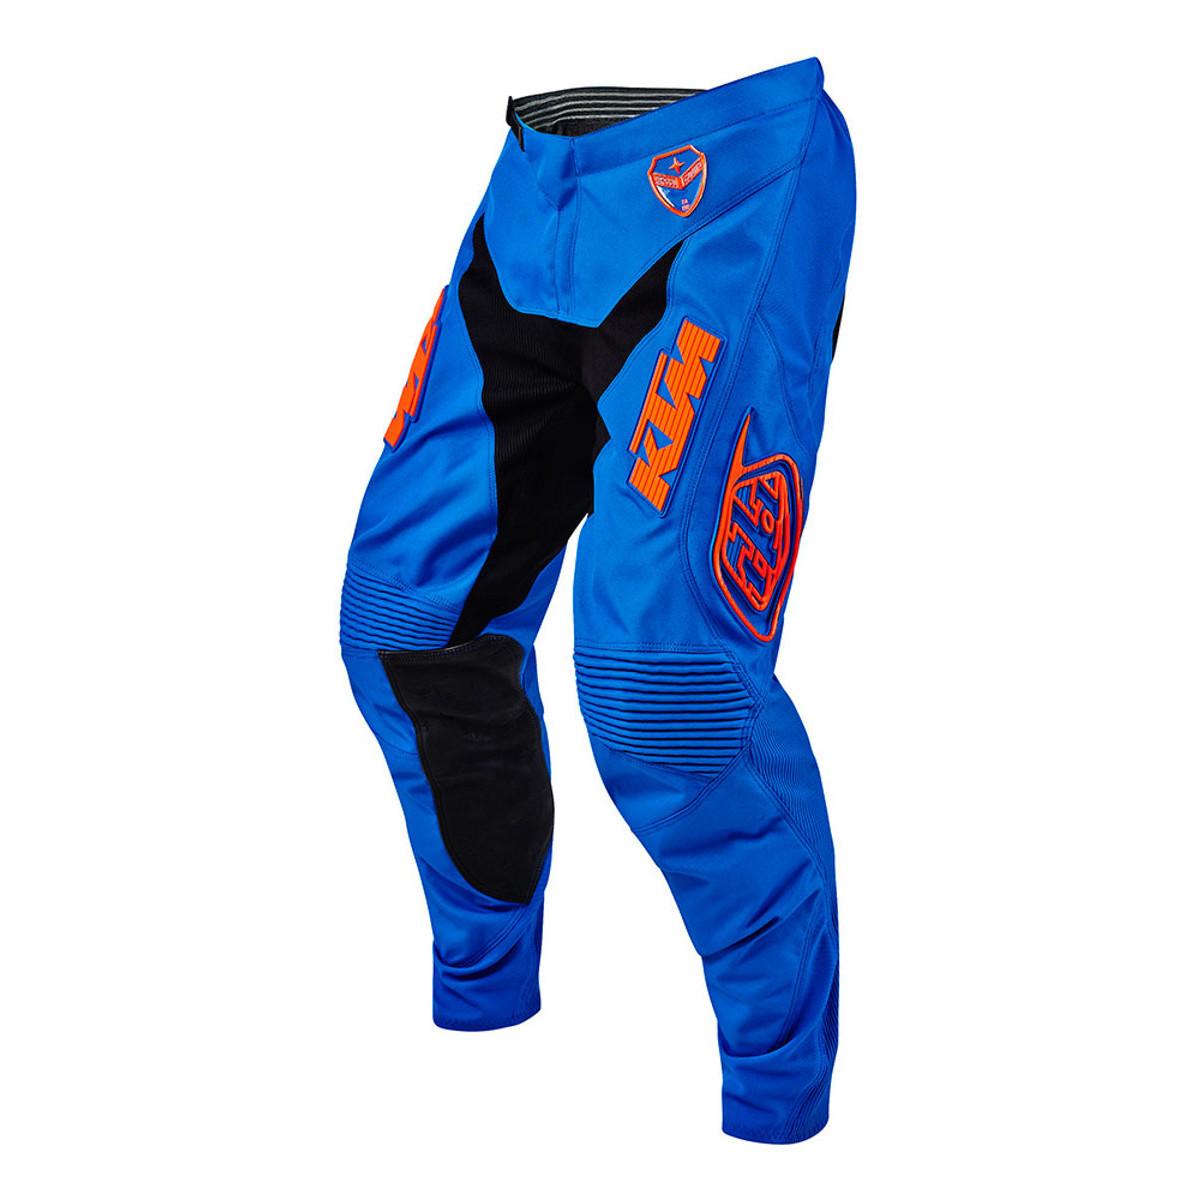 Custom Jerseys, Pants & Apparel - Canvas MX - Define Your ...